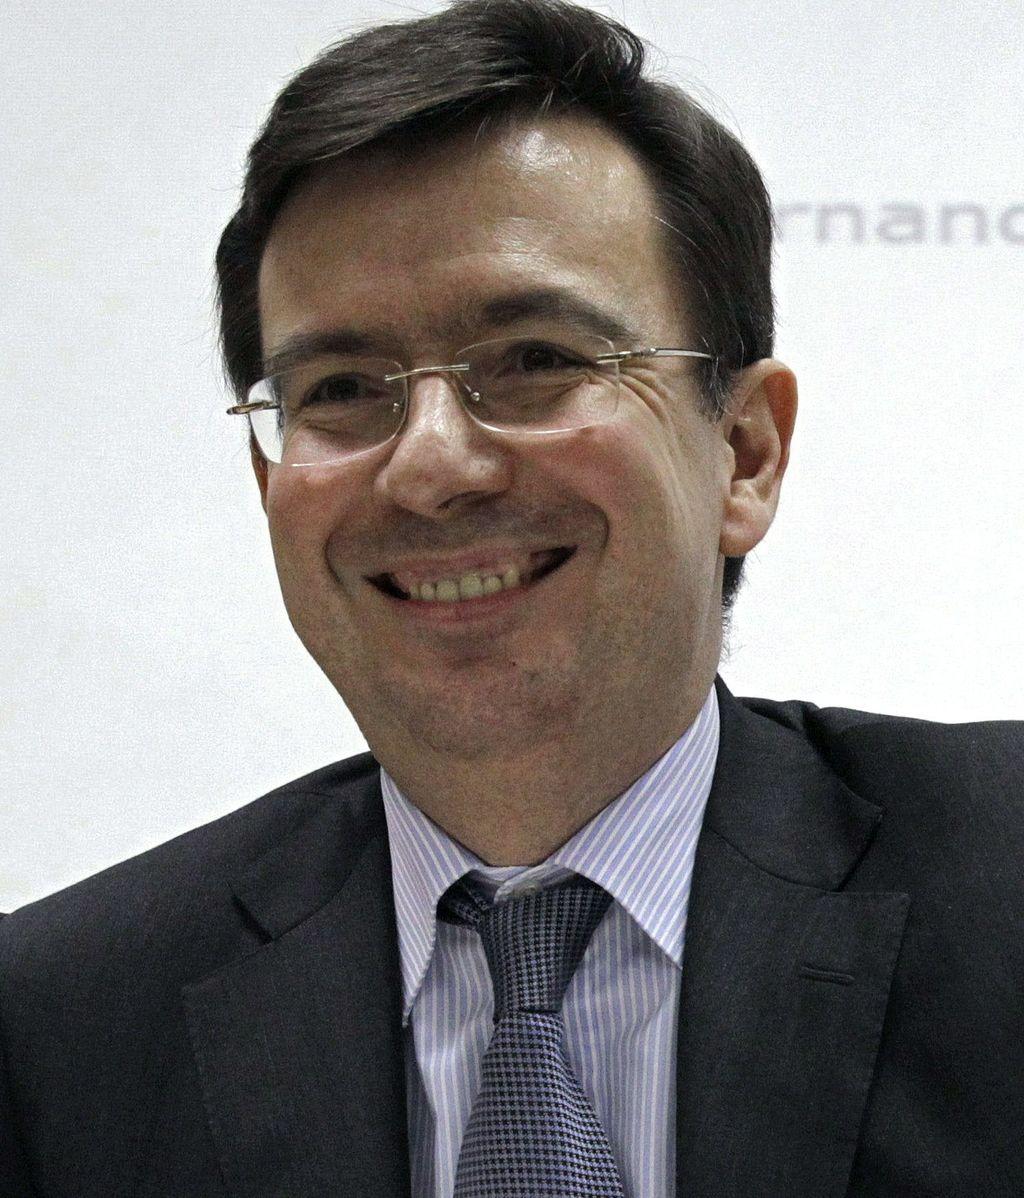 Román Escolano, presidente del ICO, sustituirá a Magdalena Álvarez